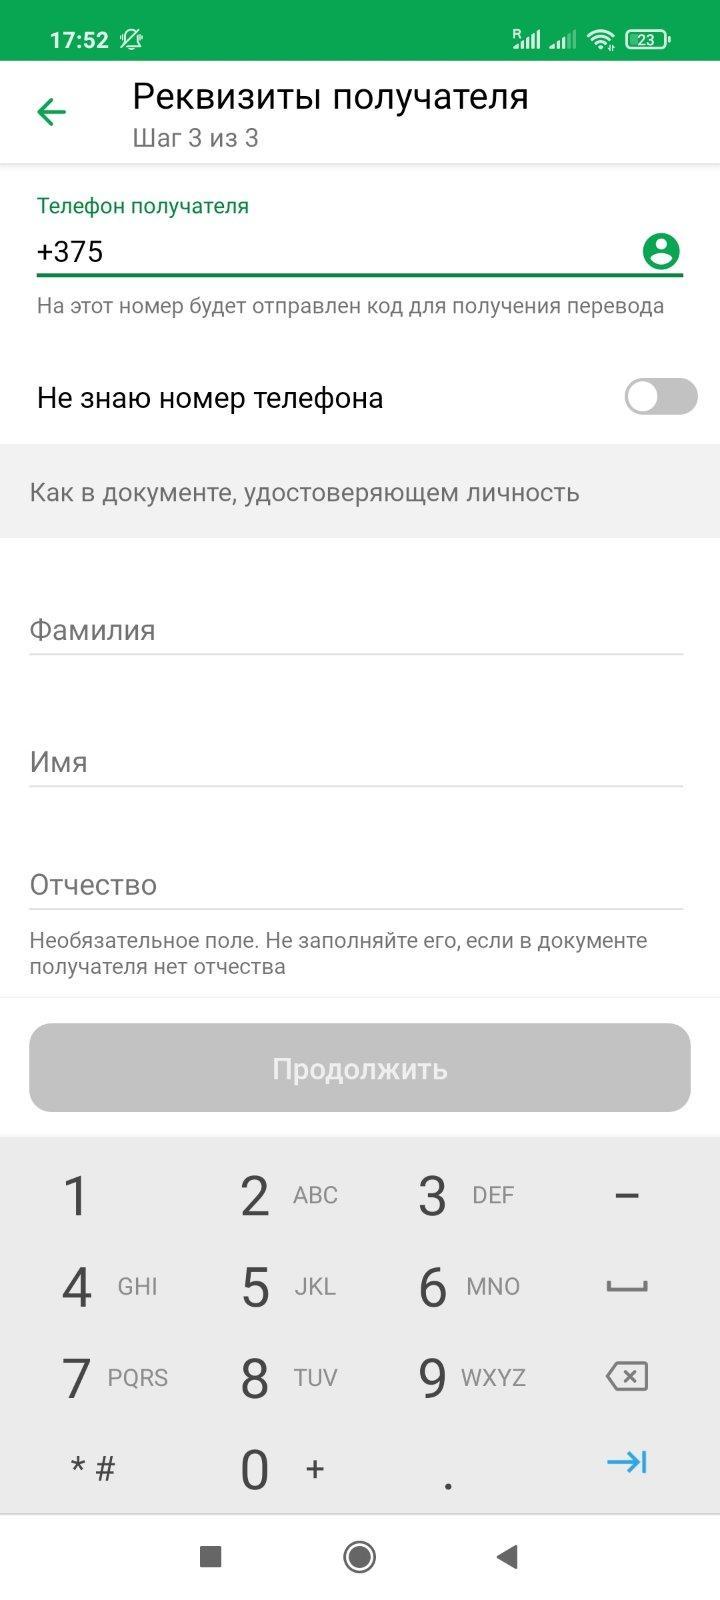 C:\Users\Лена\Desktop\изображение_viber_2021-04-19_17-54-38.jpg